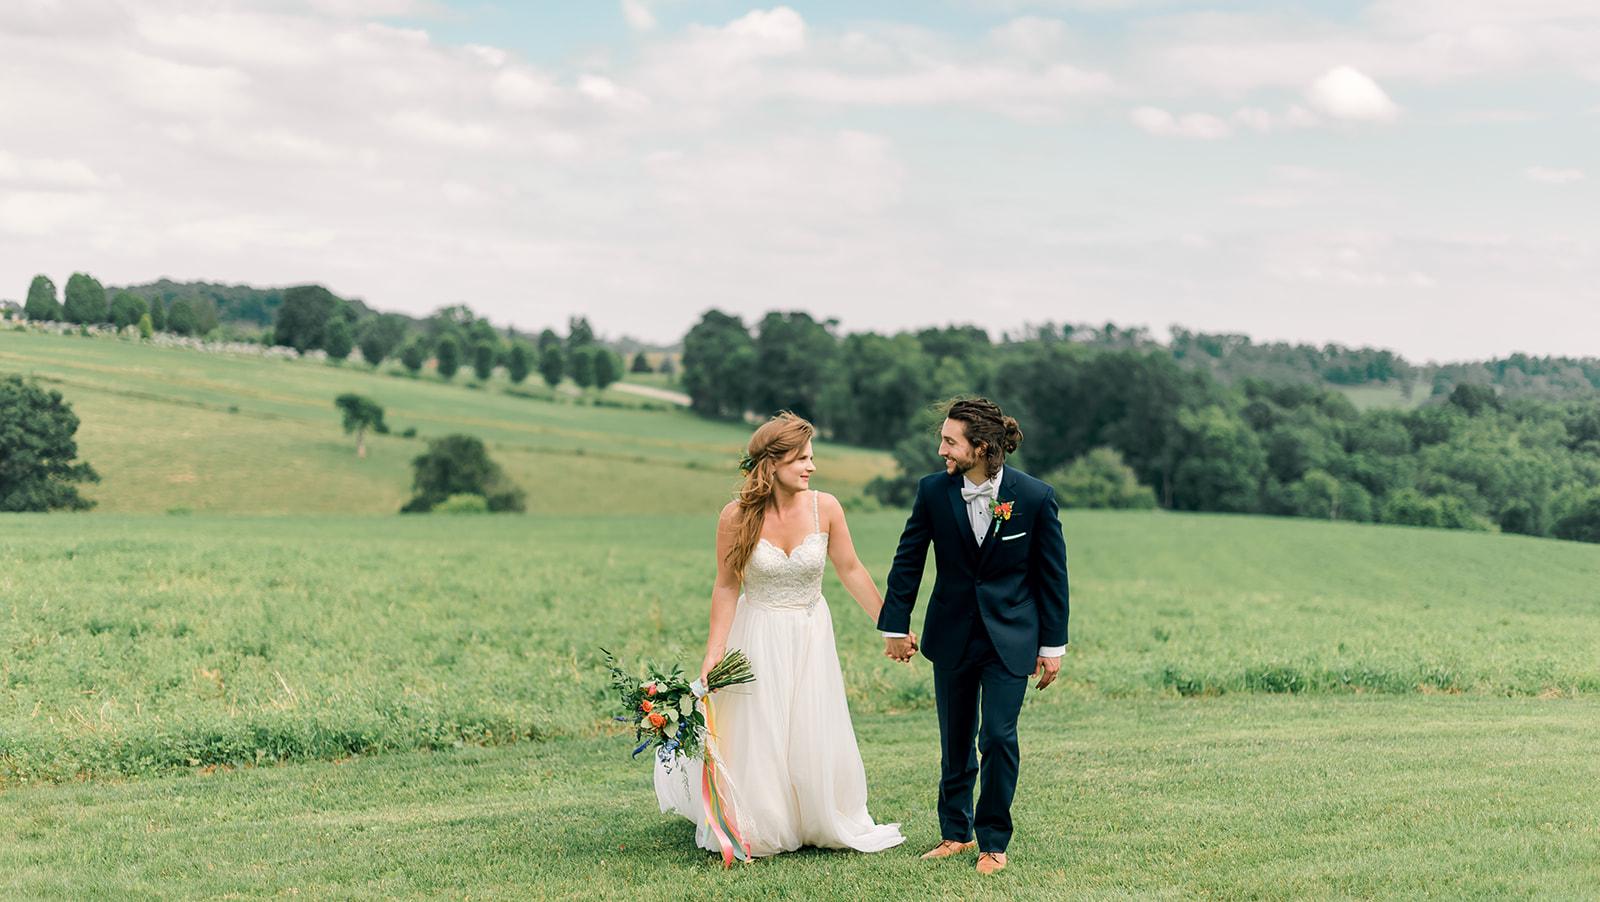 Fun & Colorful Barn Wedding Portraits at Heaven Sent Farms in Avella Dawn Derbyshire Photography  (3).jpg